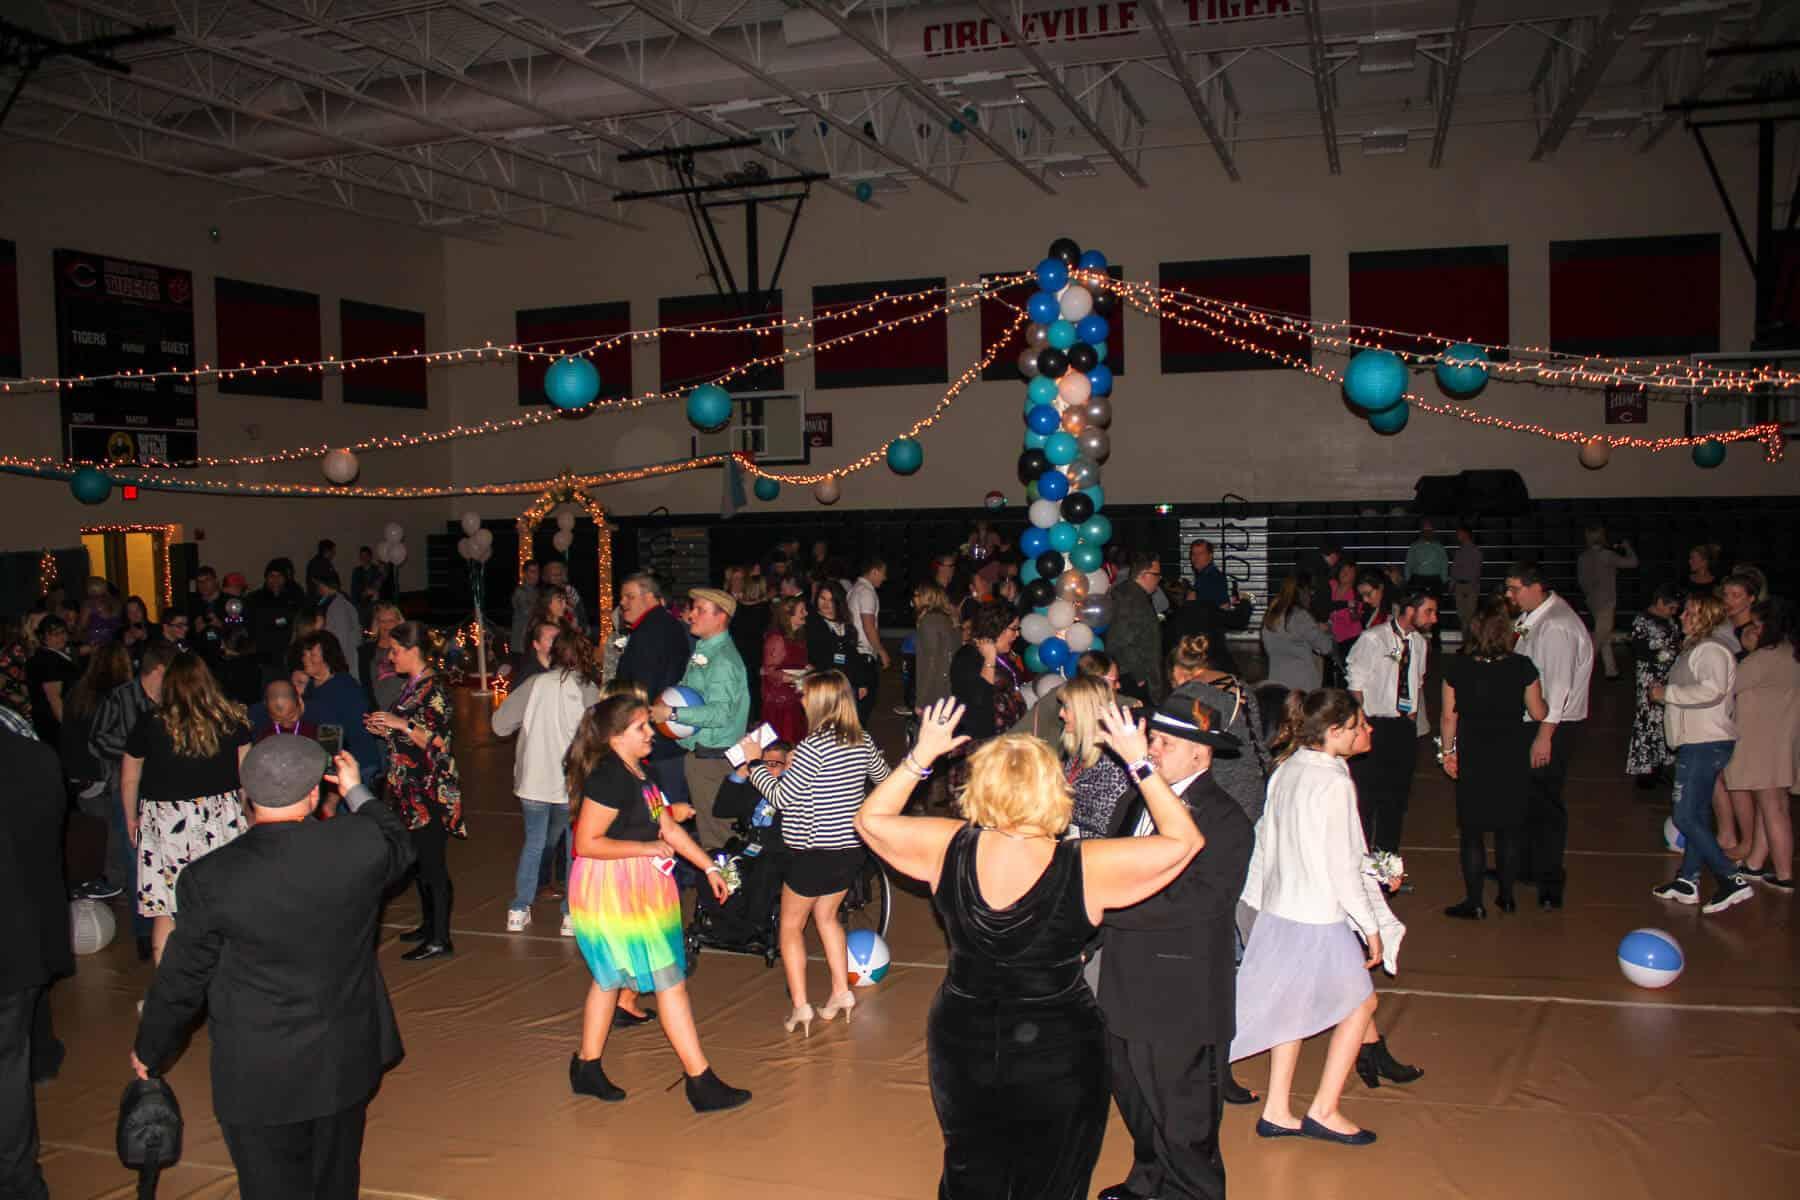 Night to Shine Dance Floor (Photo Courtesy of Travis Mitchell)